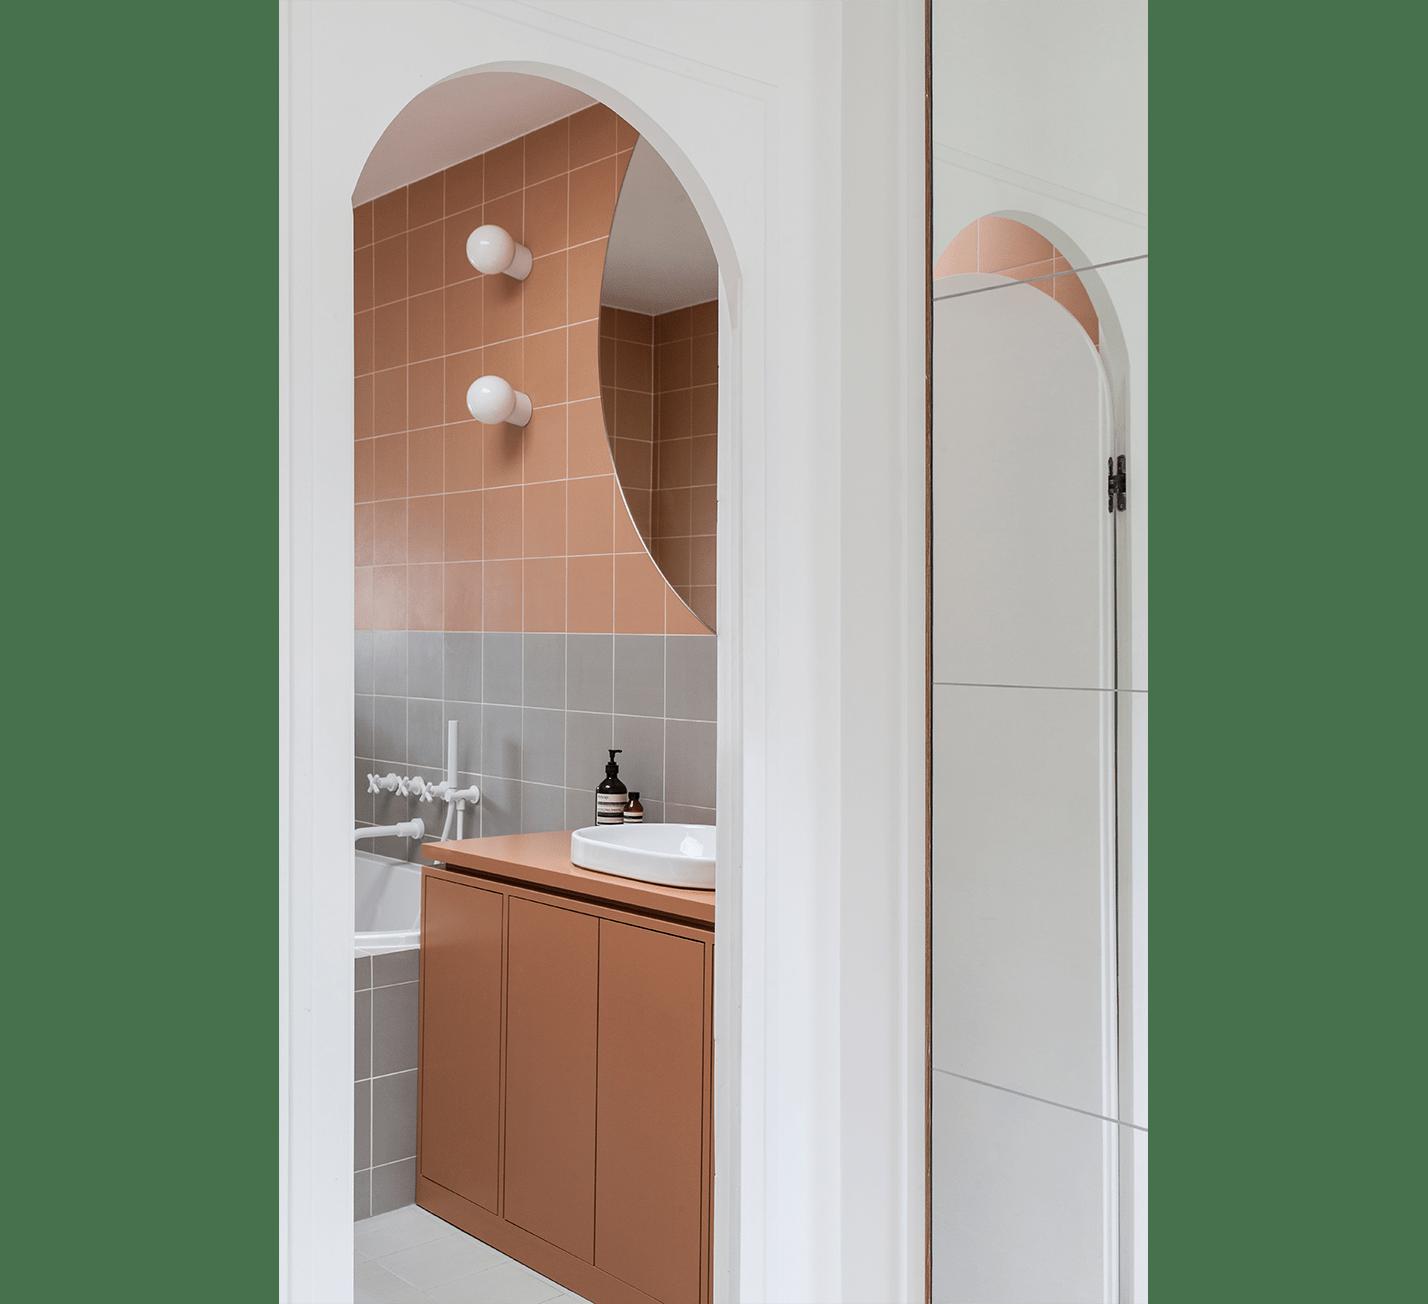 Projet-Arlequin-Atelier-Steve-Pauline-Borgia-Architecture-interieur-08-min